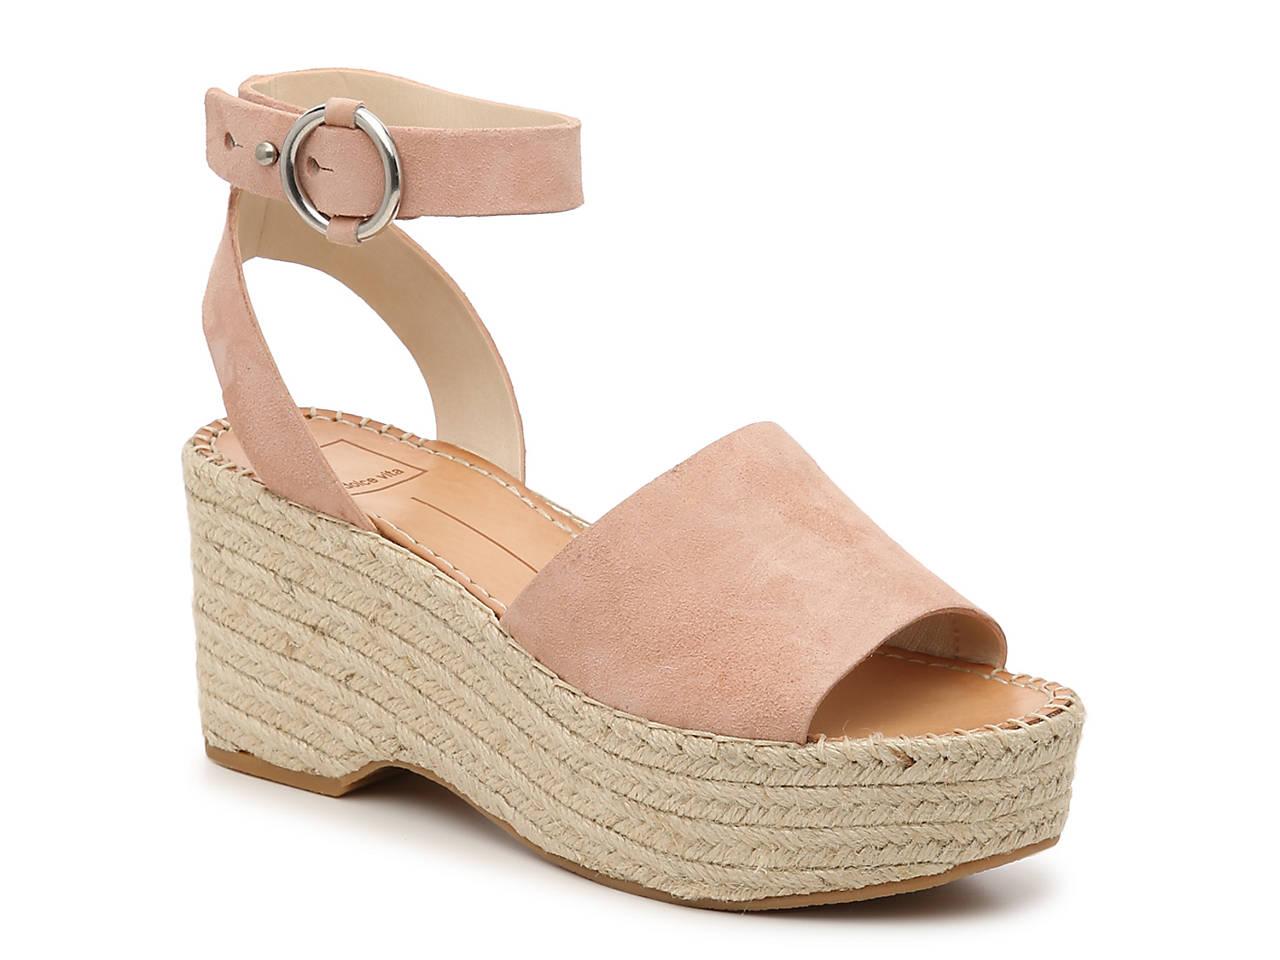 Dolce Vita Lesly Leather Platform Espadrille Sandals 0Zlp7